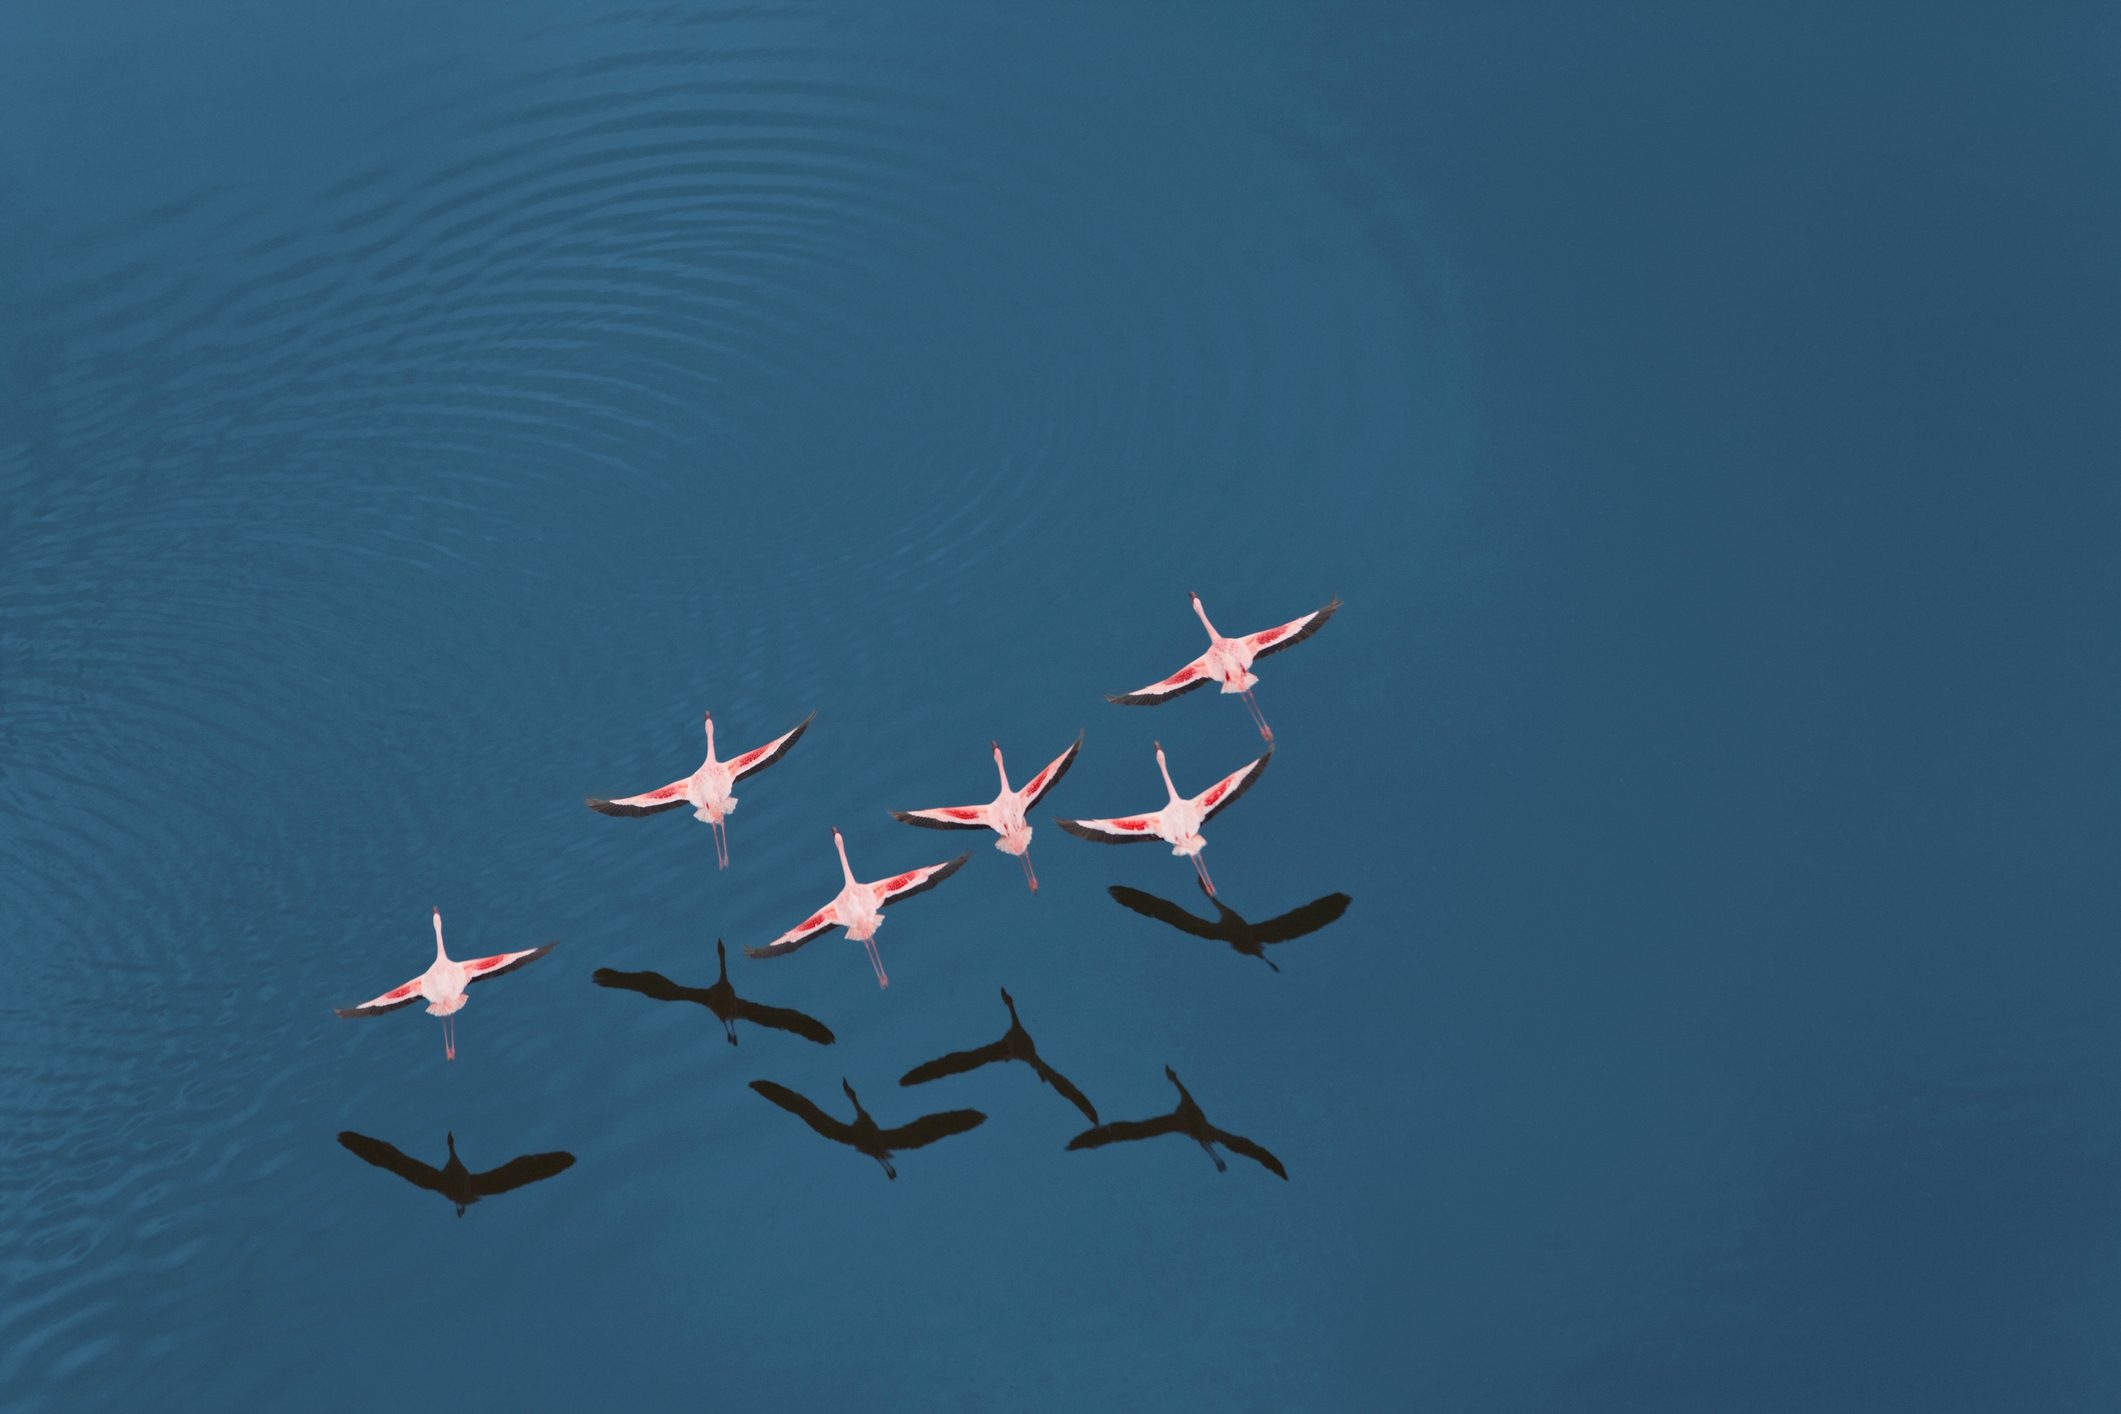 Aerial view of Lesser Flamingo (Phoenicopterus minor) flying over Lake Magadi, Rift Valley, Kenya, Africa